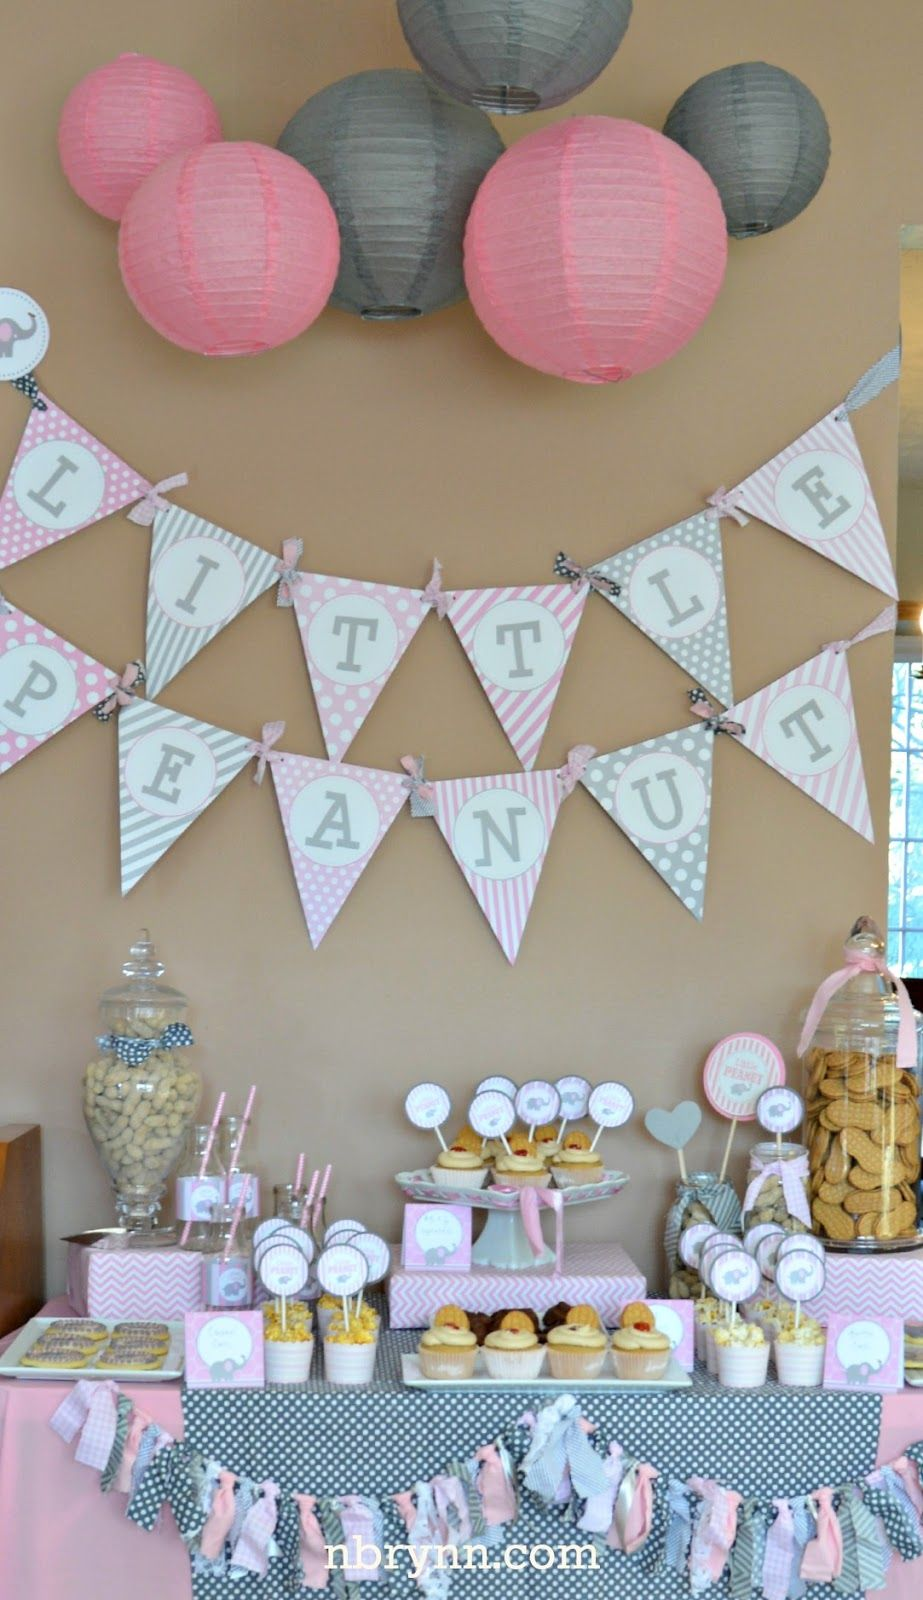 NBrynn: Little Peanut Baby Shower | Party Ideas ...